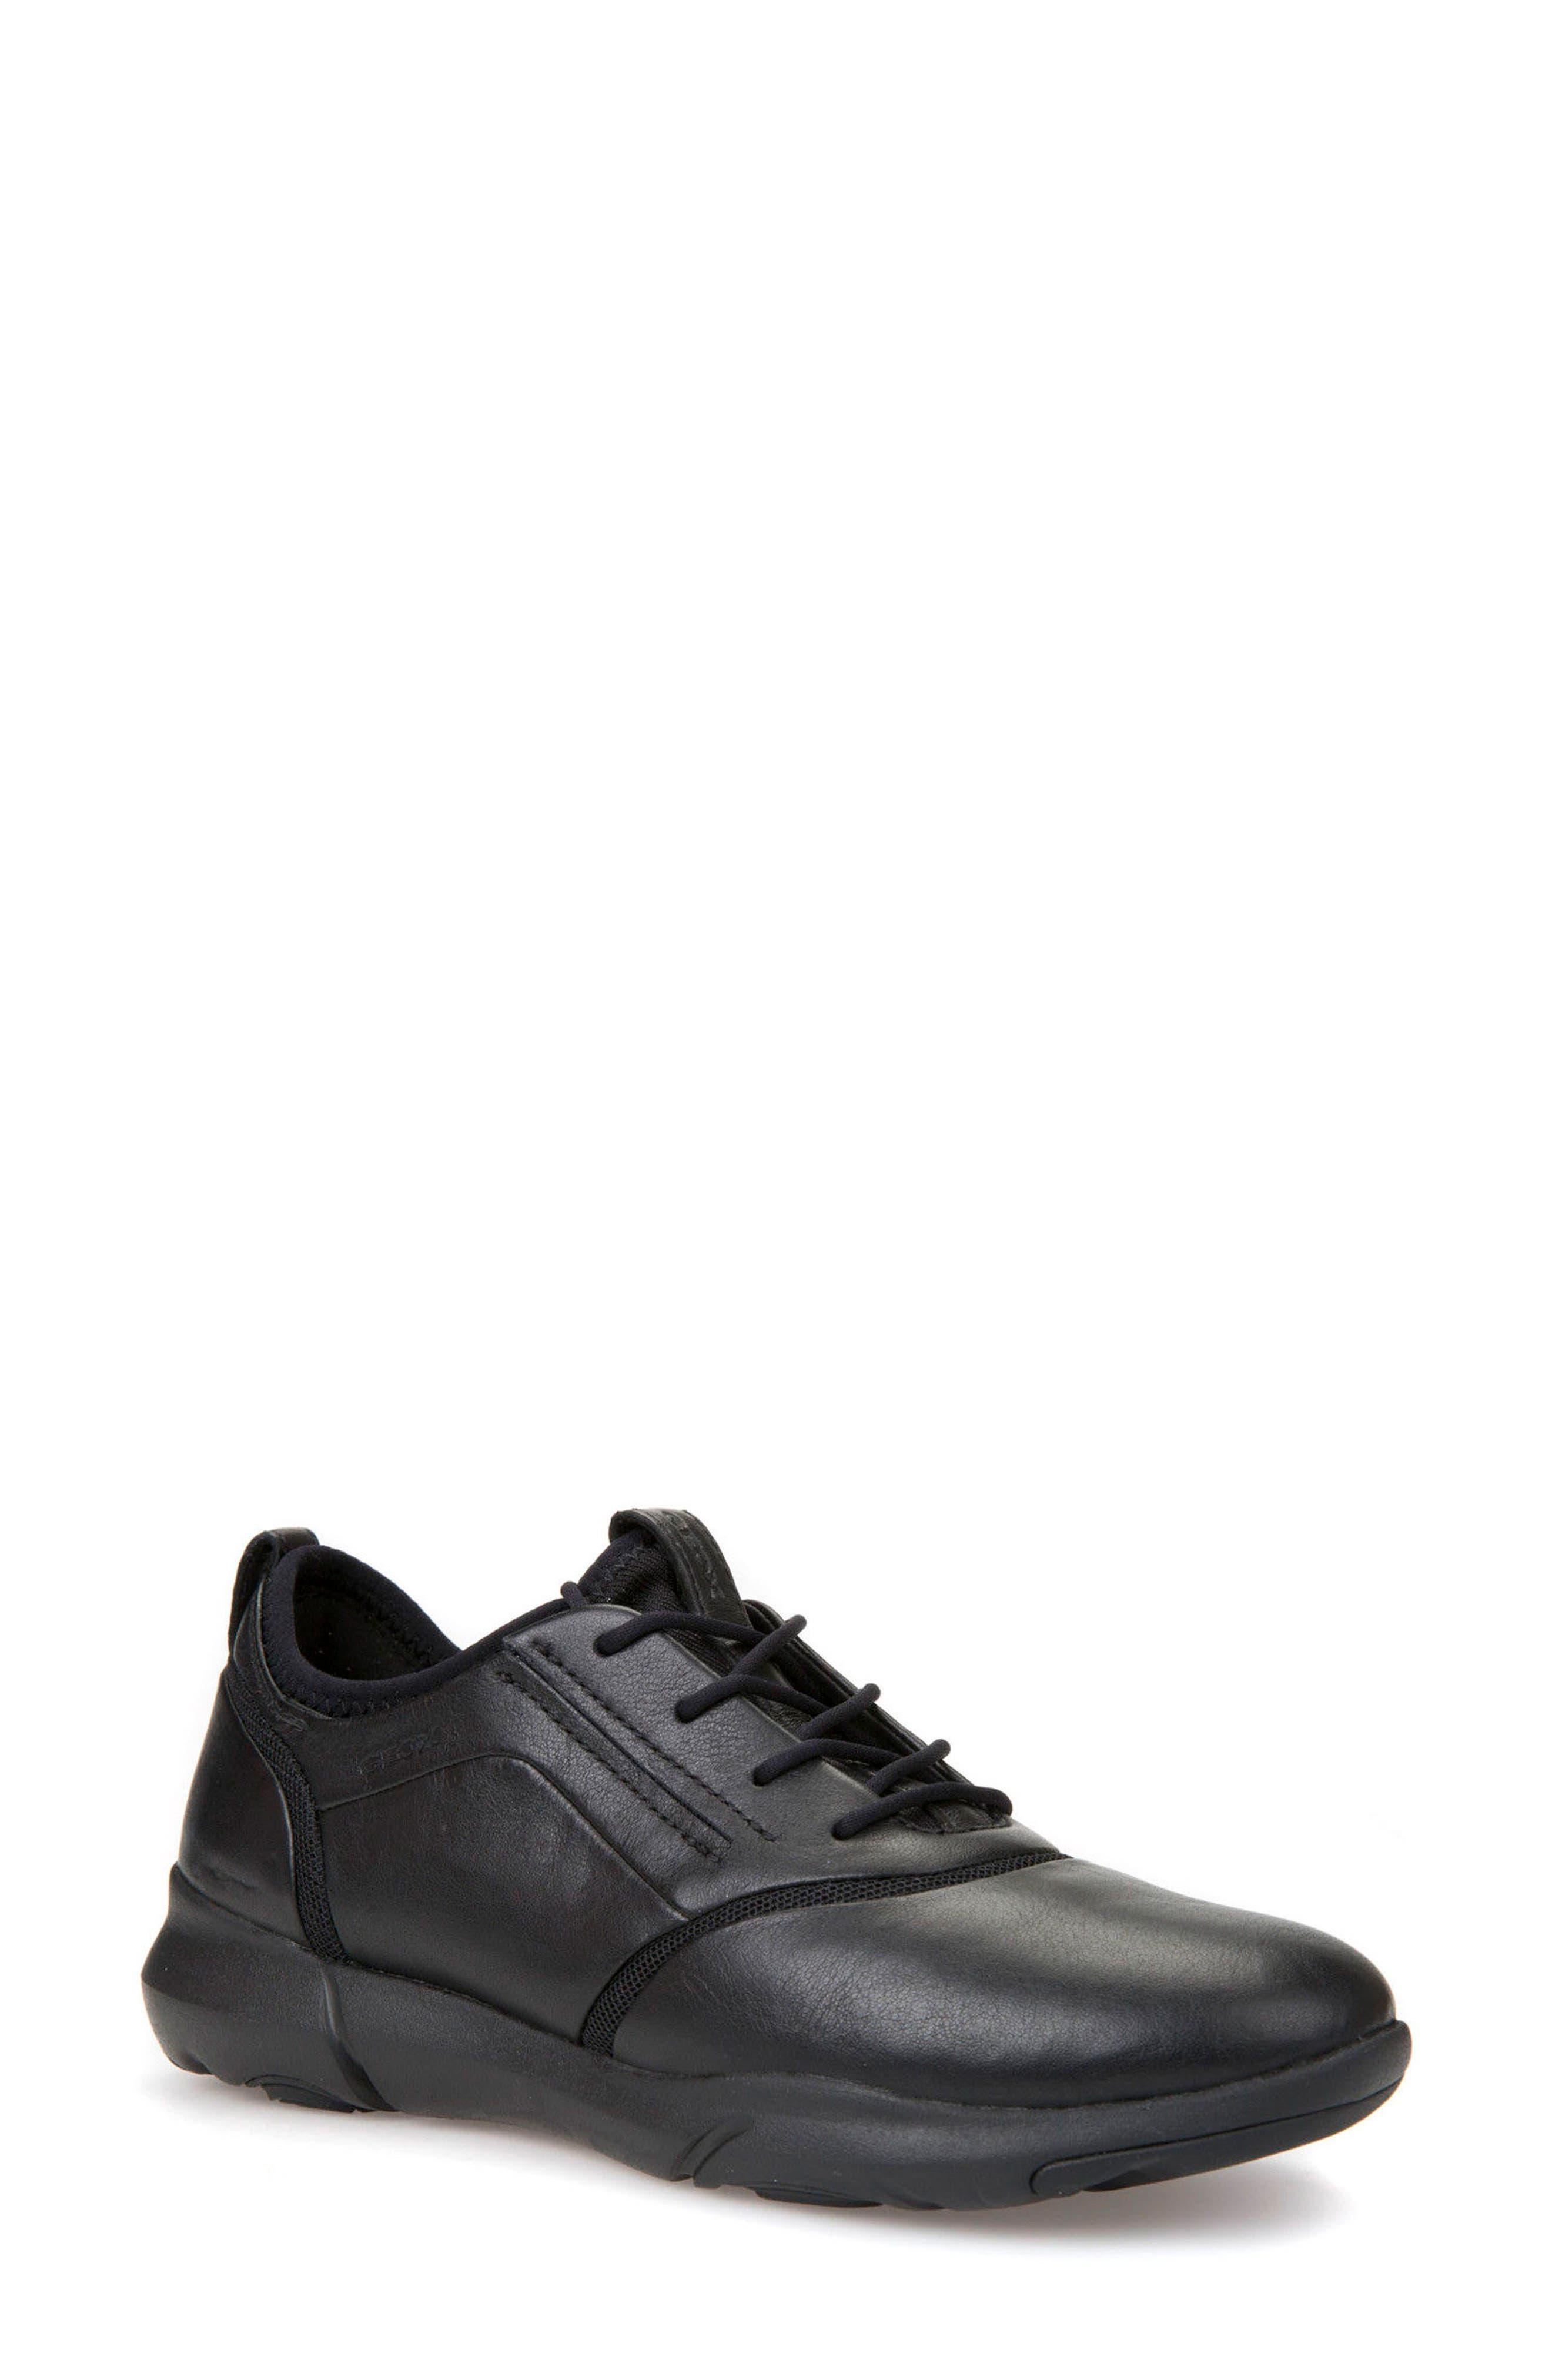 Nebula S 2 Low Top Sneaker,                             Main thumbnail 1, color,                             001